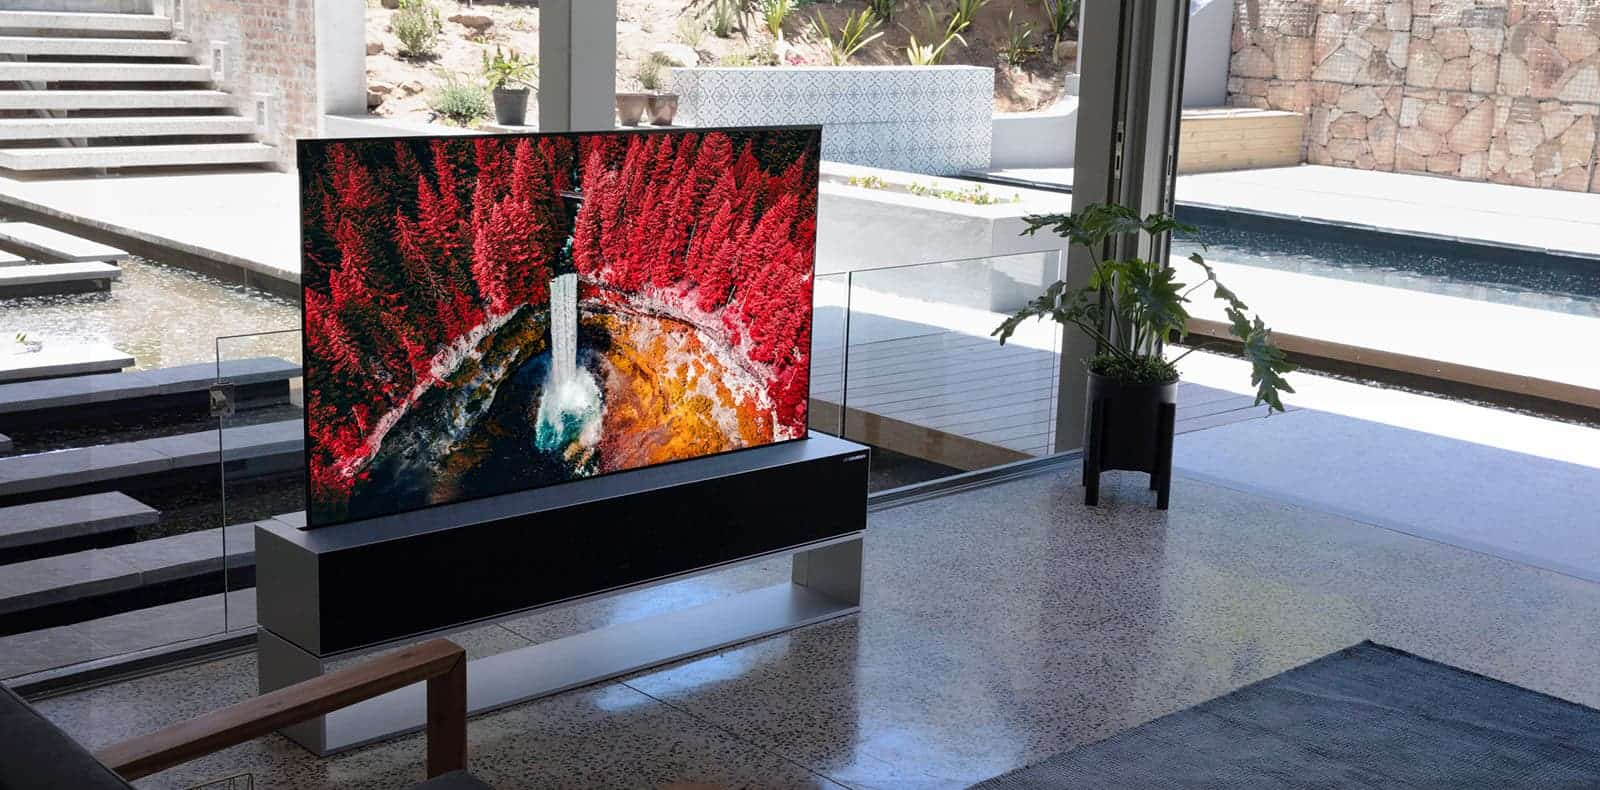 LG katlanabilir TV